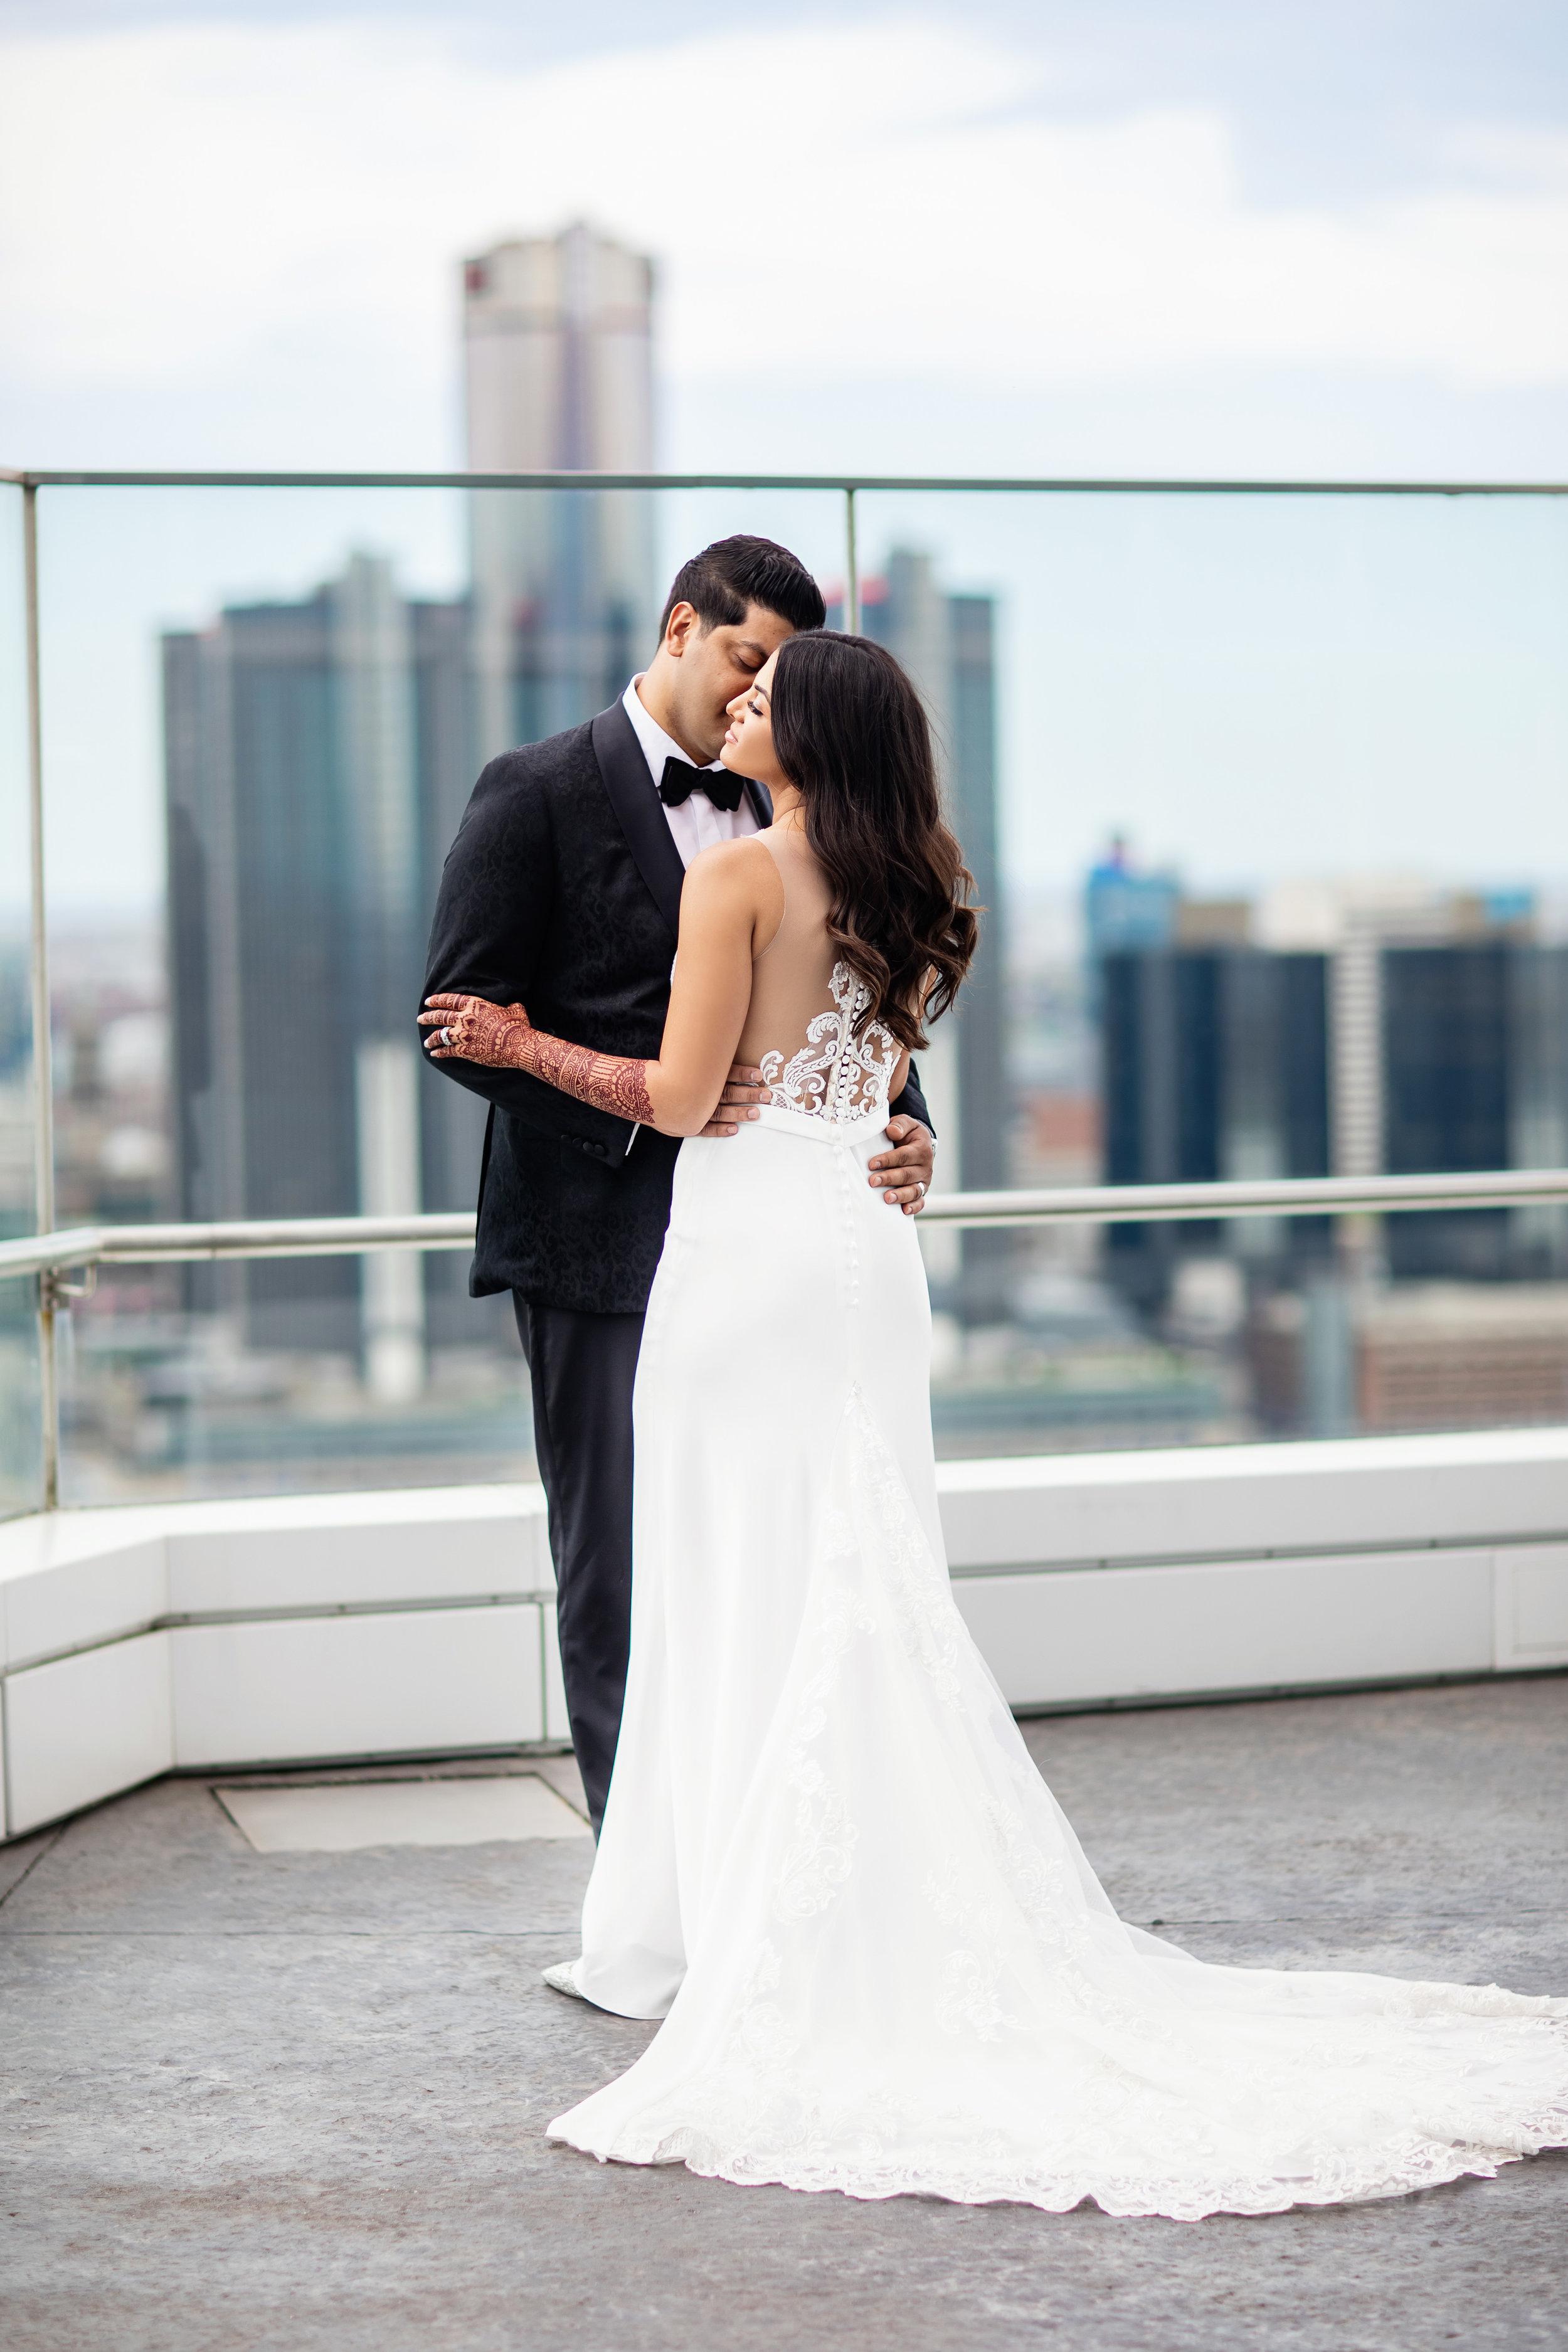 stylish-wedding-photography-windsor-toronto-ontario-wedding-photographer-winery-eryn-shea-photography-27.JPG